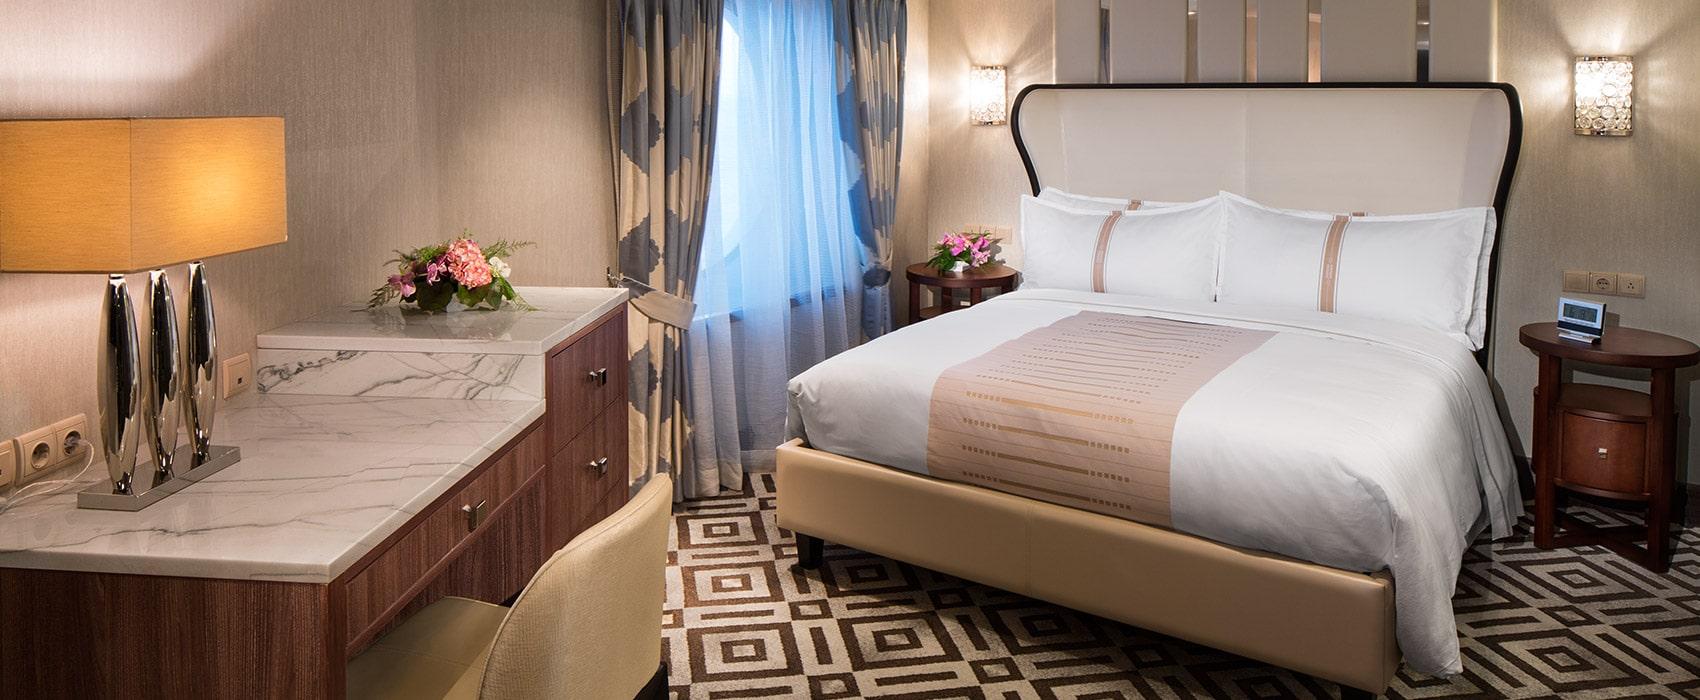 Desire Venice Cruise | Staterooms